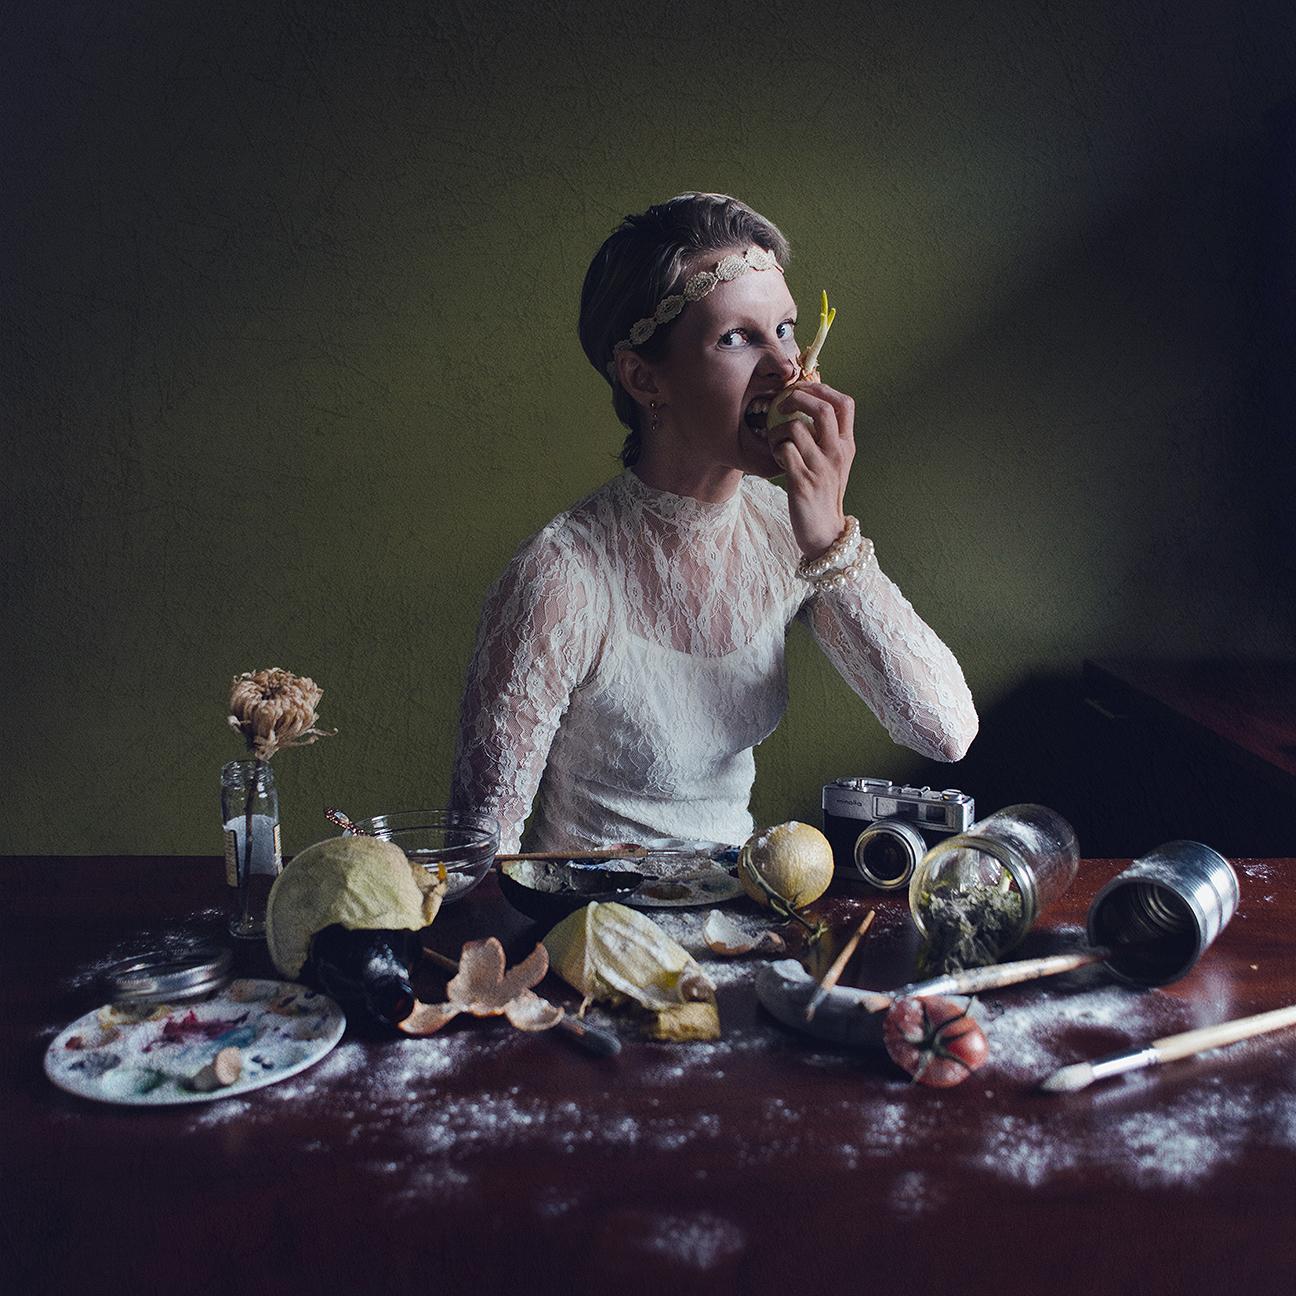 starving artist fine art photography